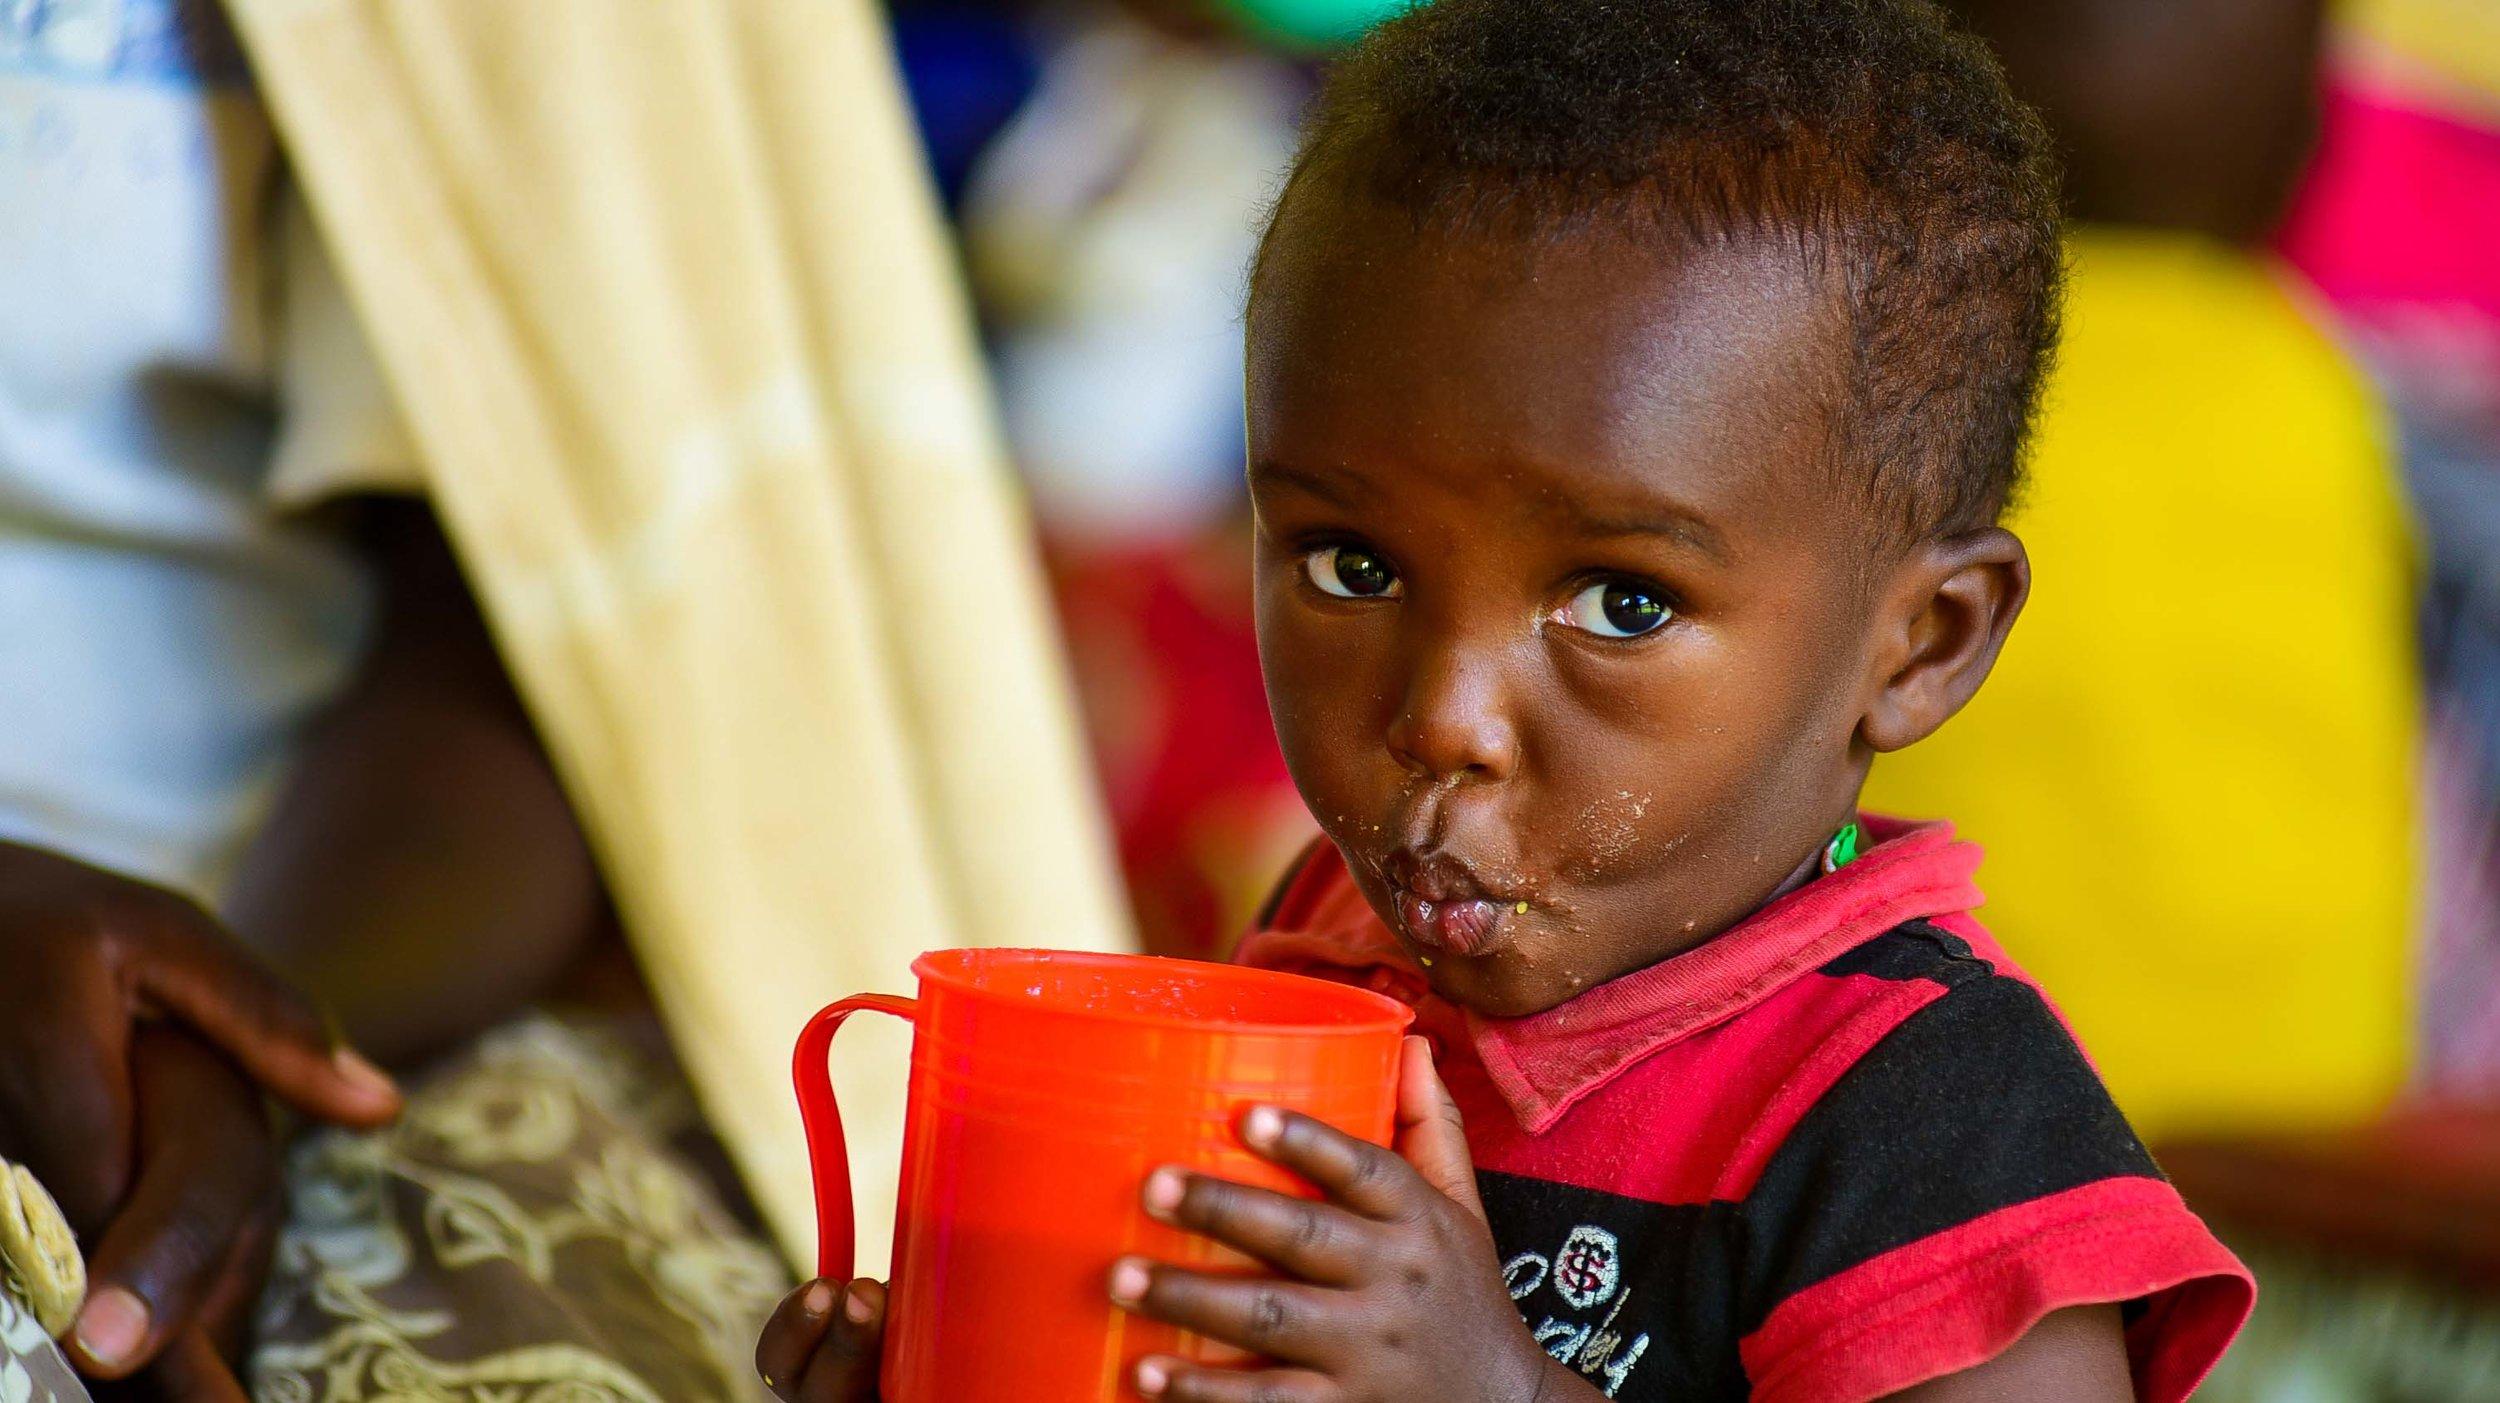 Umwana anywa Sosoma mu mahugurwa atangwa na GHI ku bijyanye no kuboneza urubyaro yabereye ku kigo nderabuzima cya Gatagara mu karere ka Musanze, Rwanda.